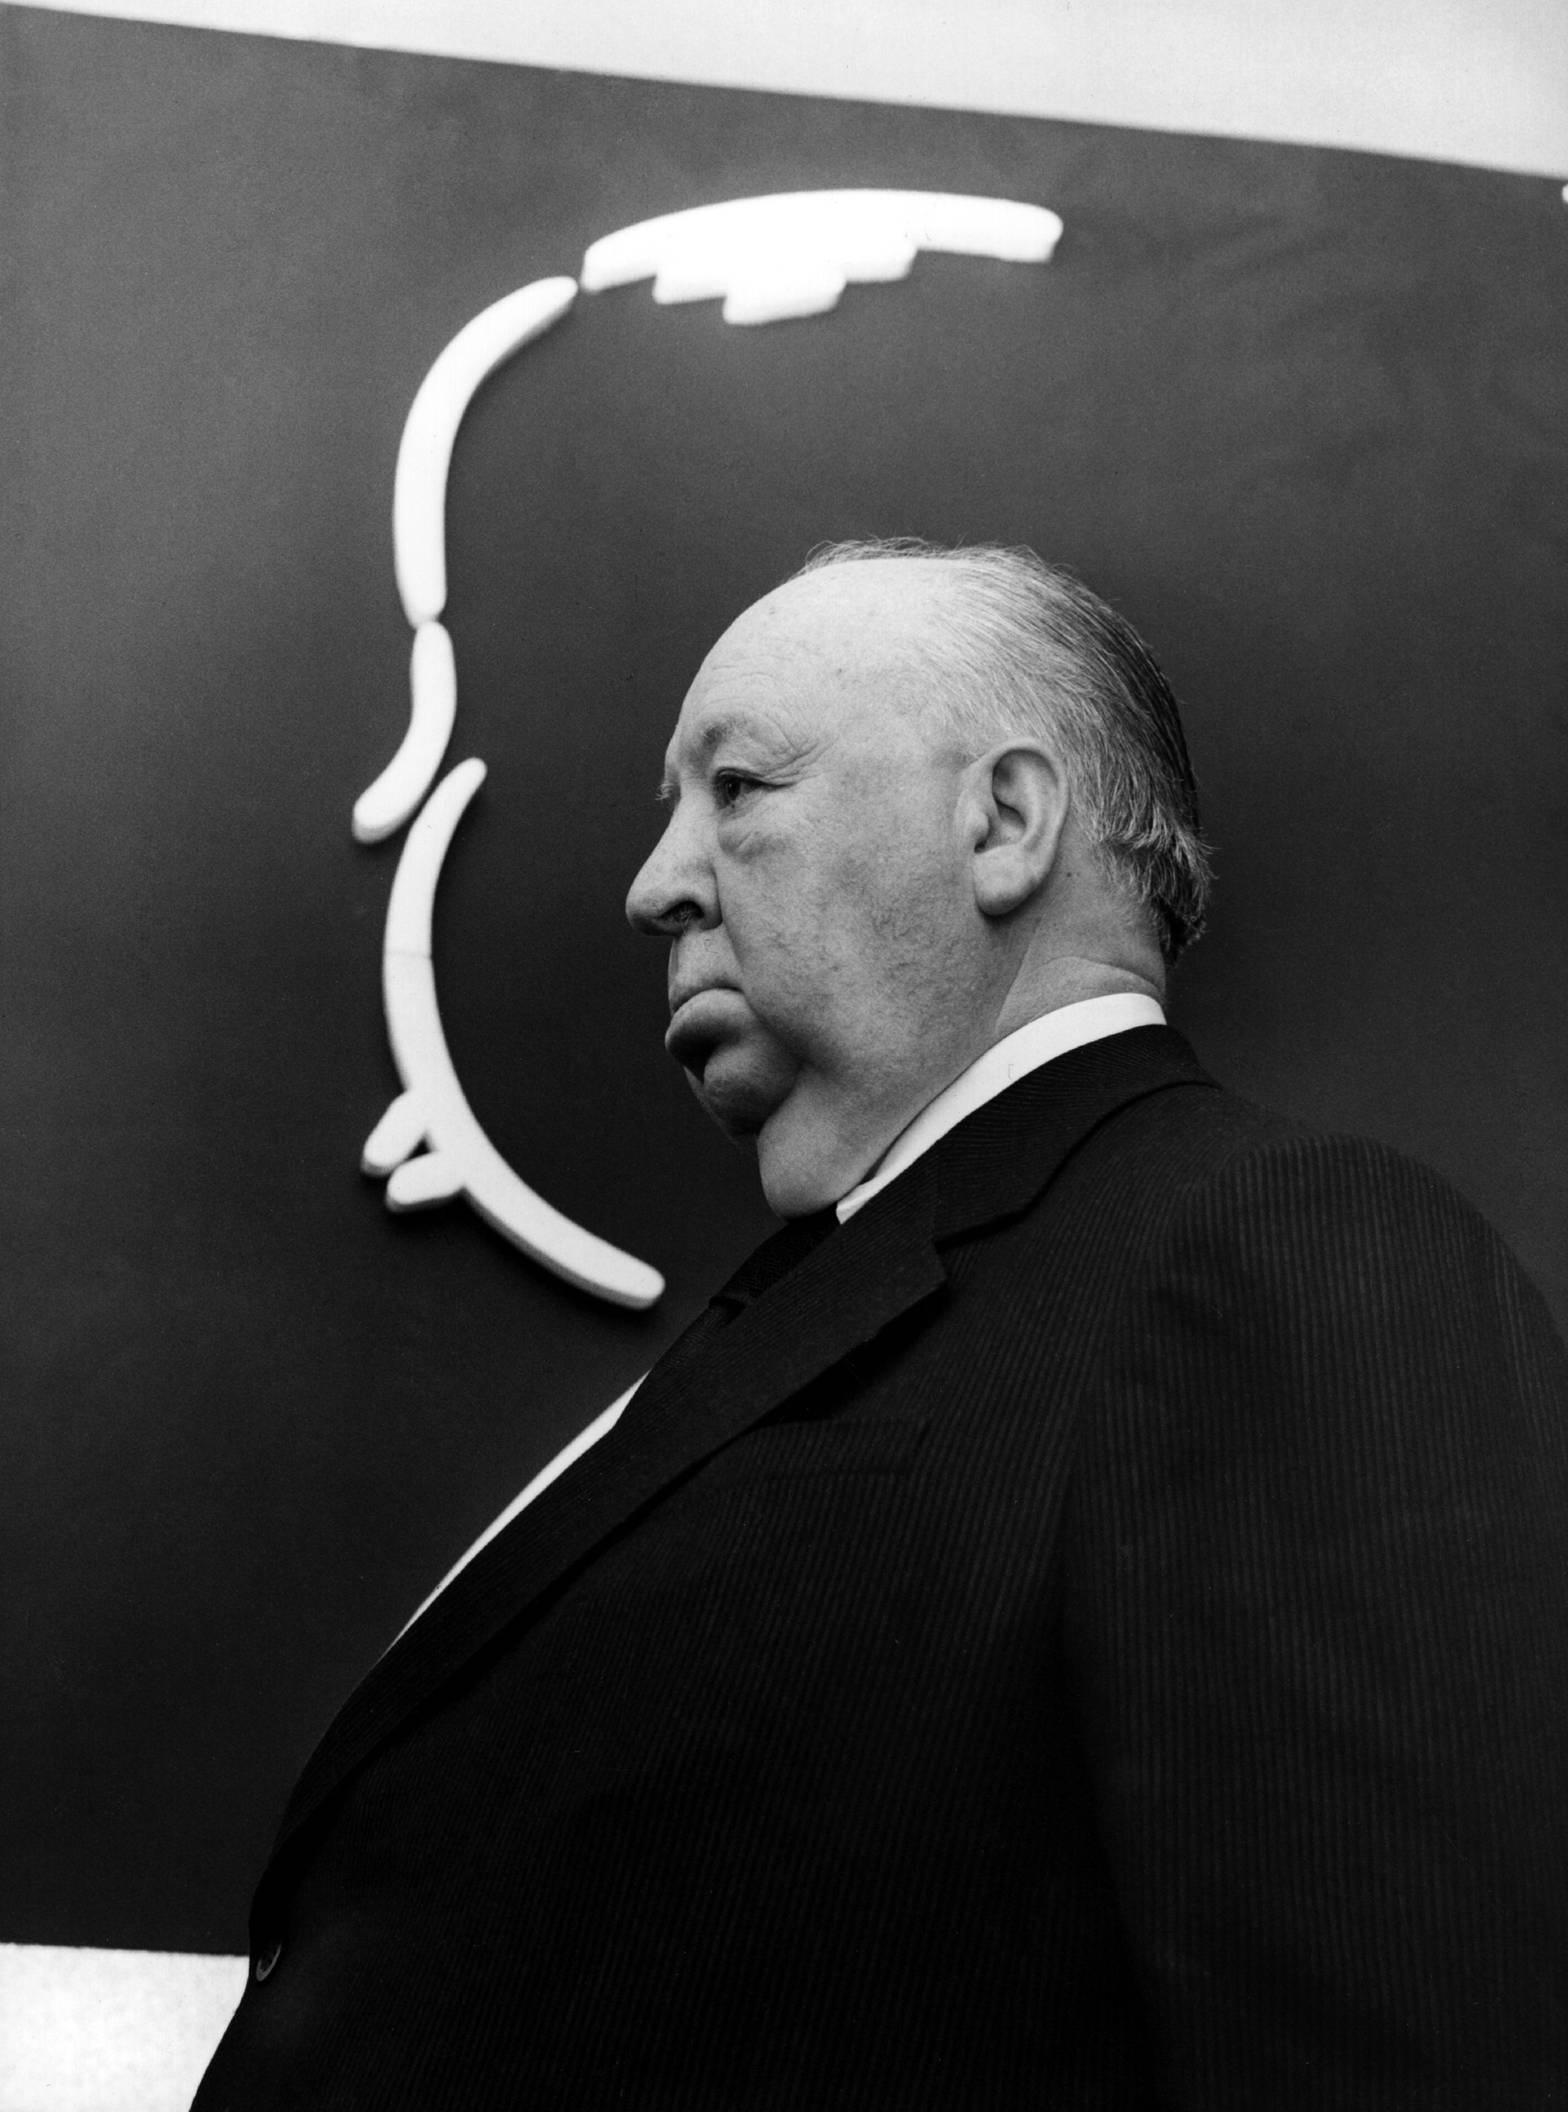 immagine del regista alfred Hitchcock